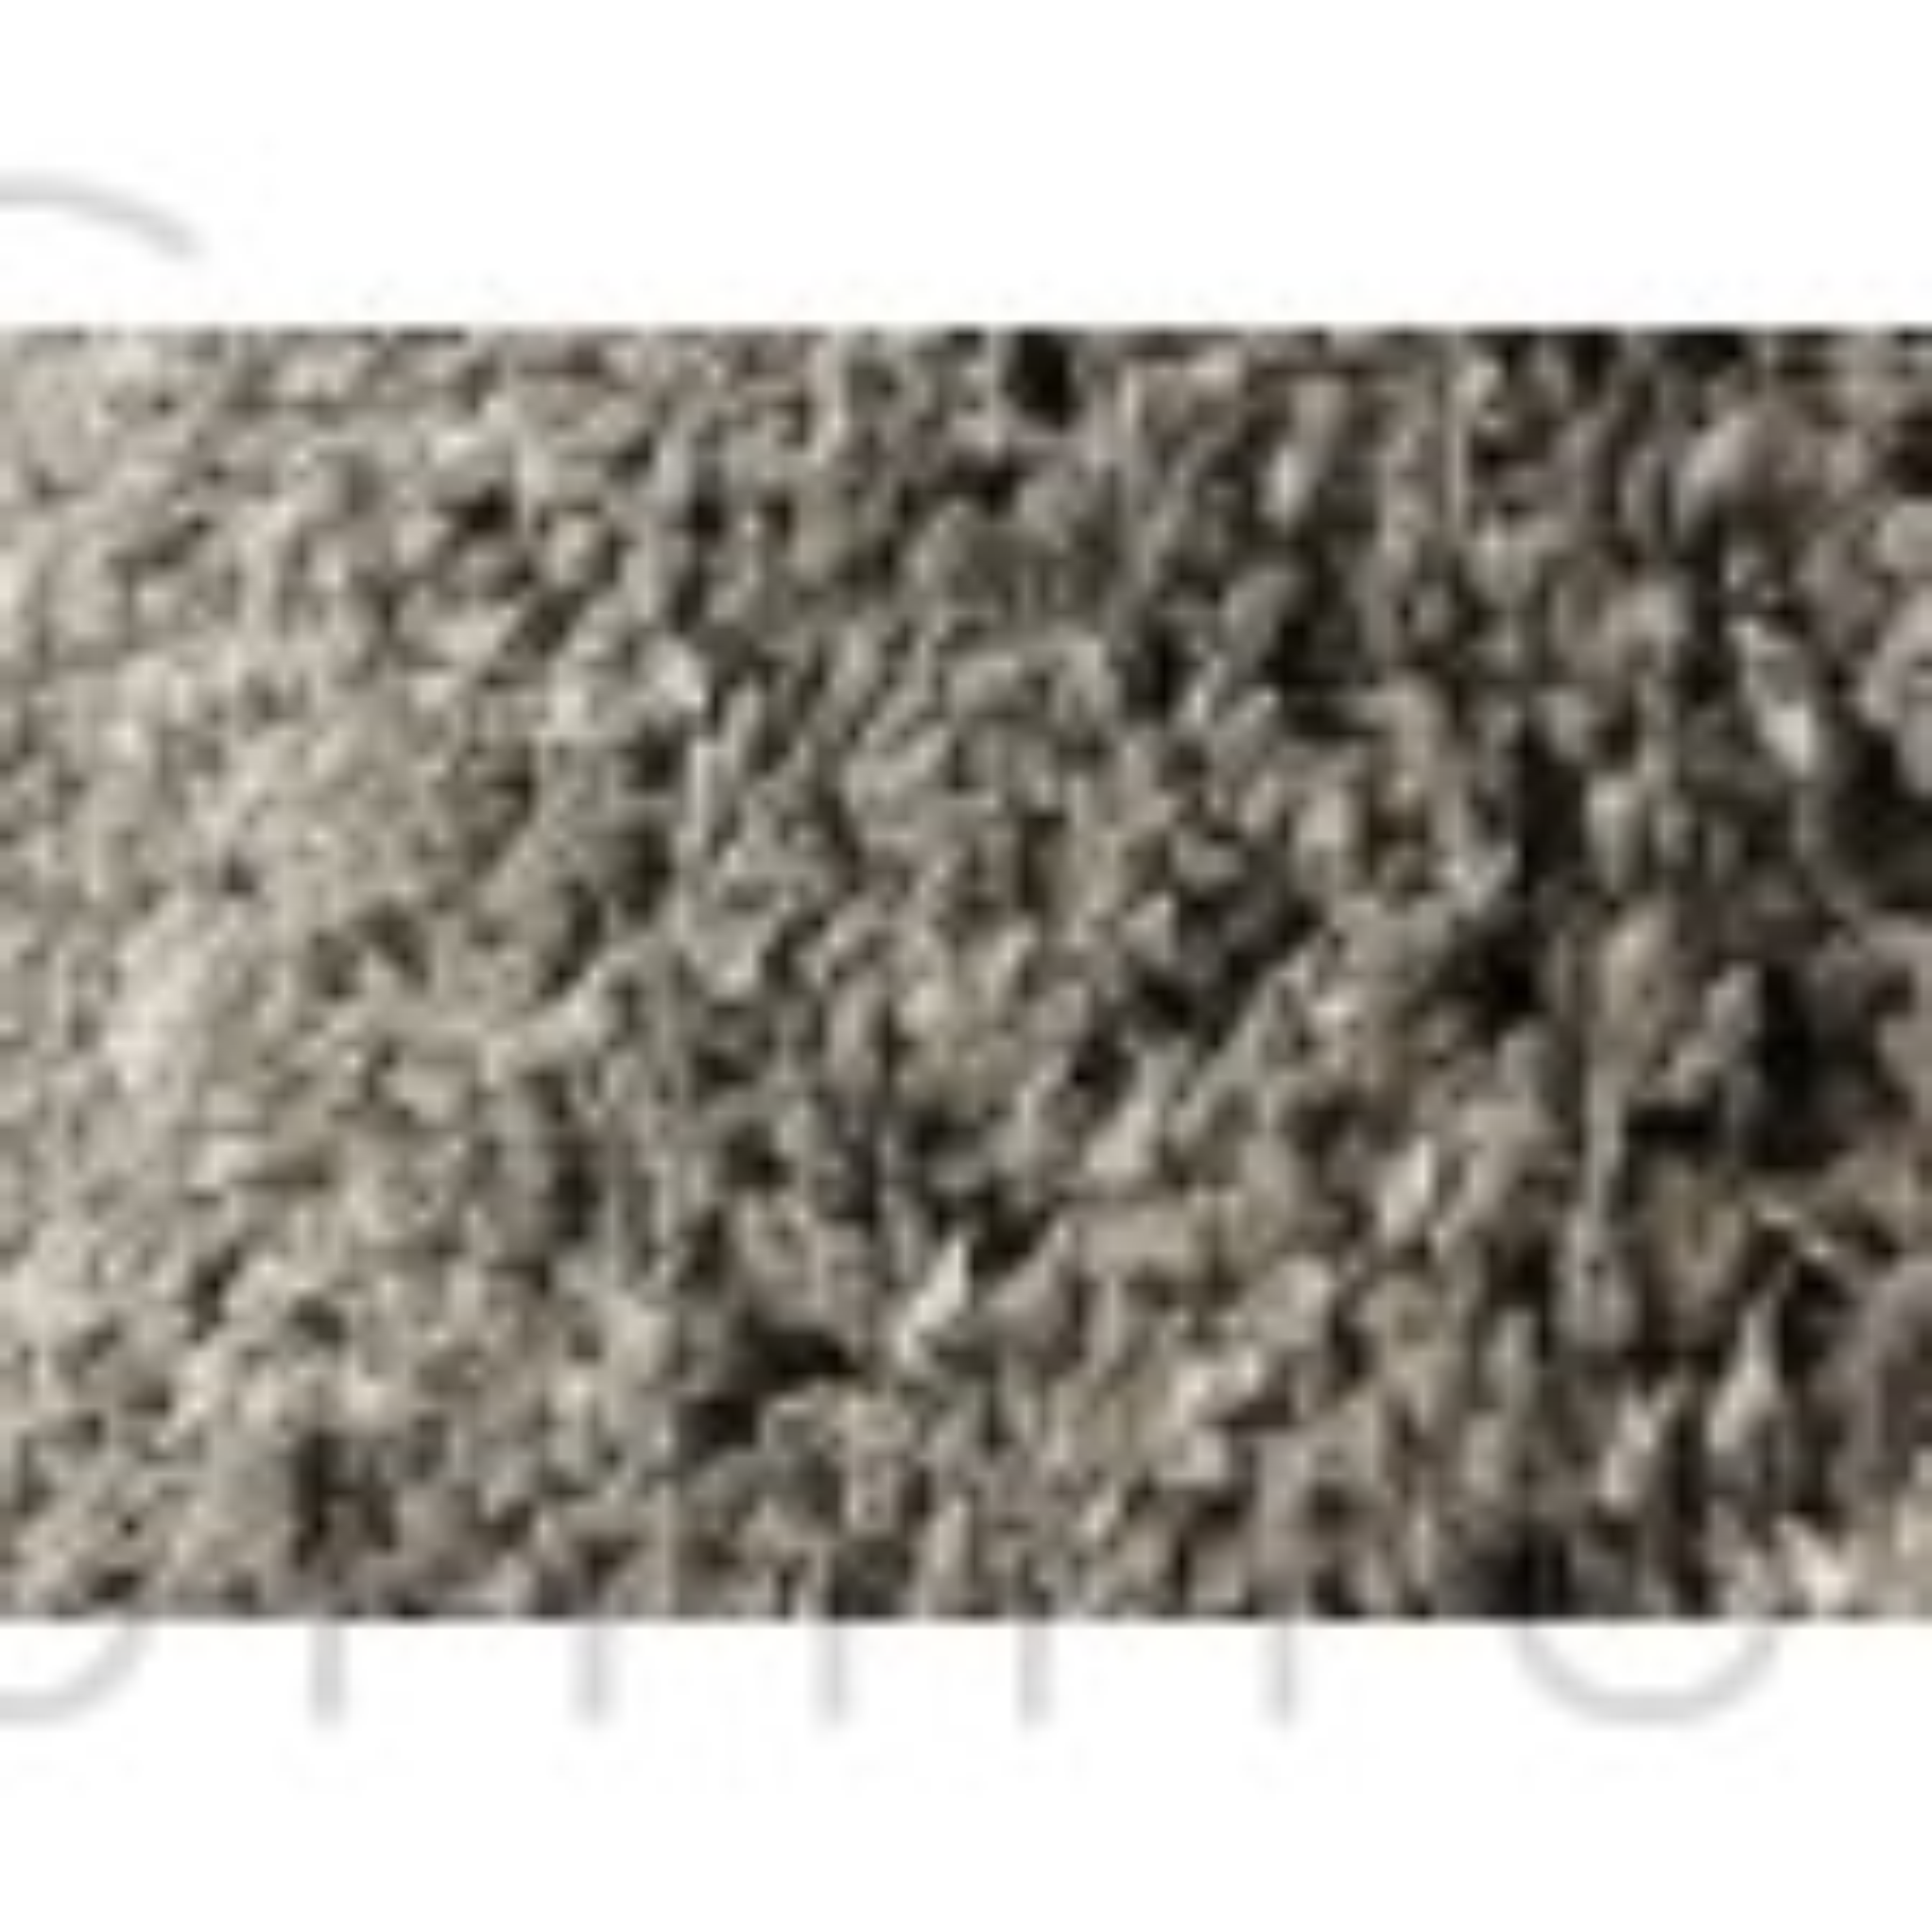 "Athena Shaggy Rug - Charcoal Grey - Size 140 x 200 cm (4'7"" x 6'7"")"